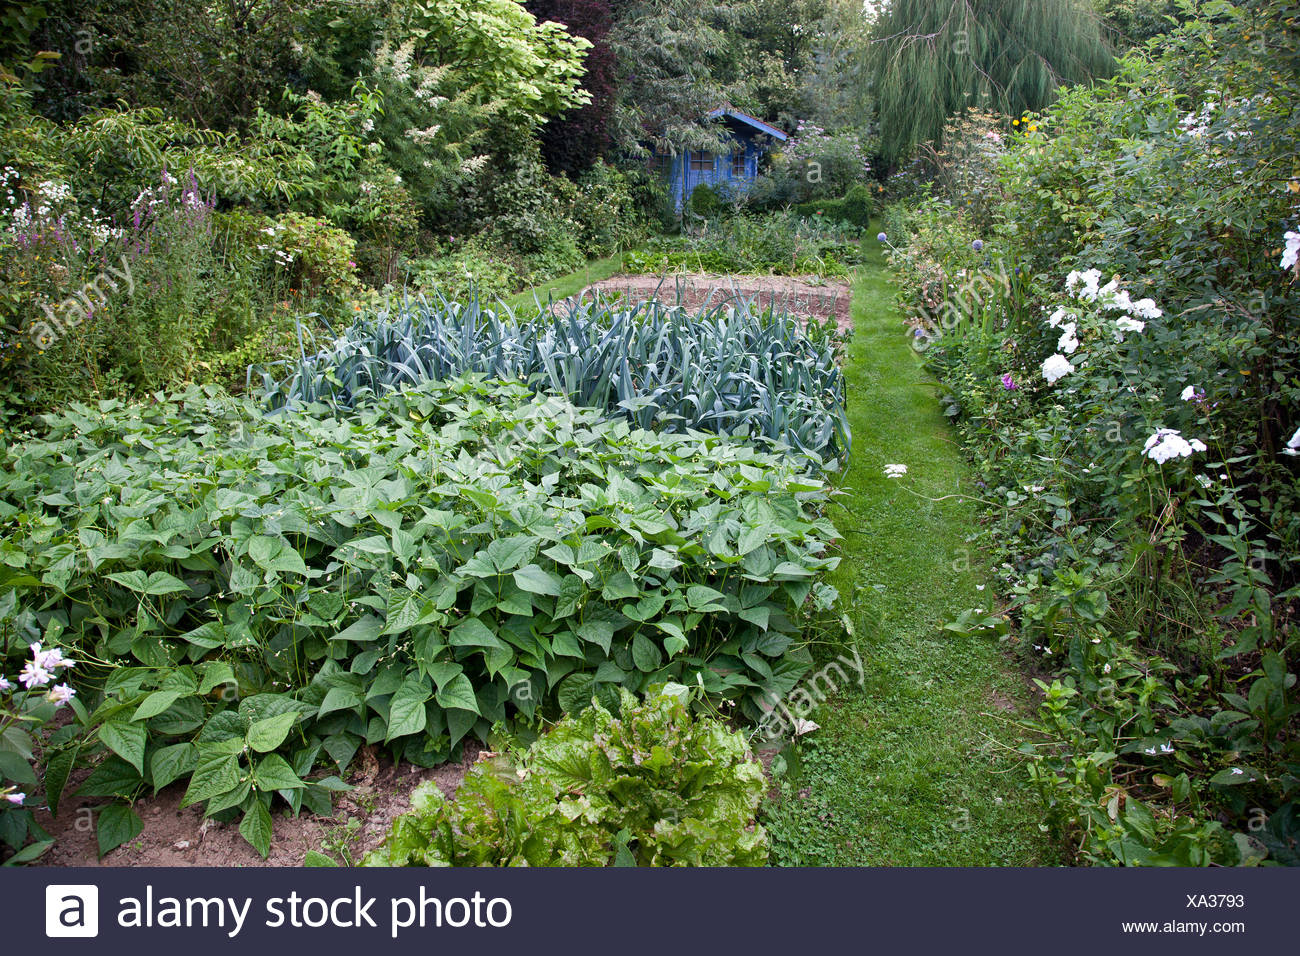 Kitchen garden at Jardins des Lianes - France - Stock Image